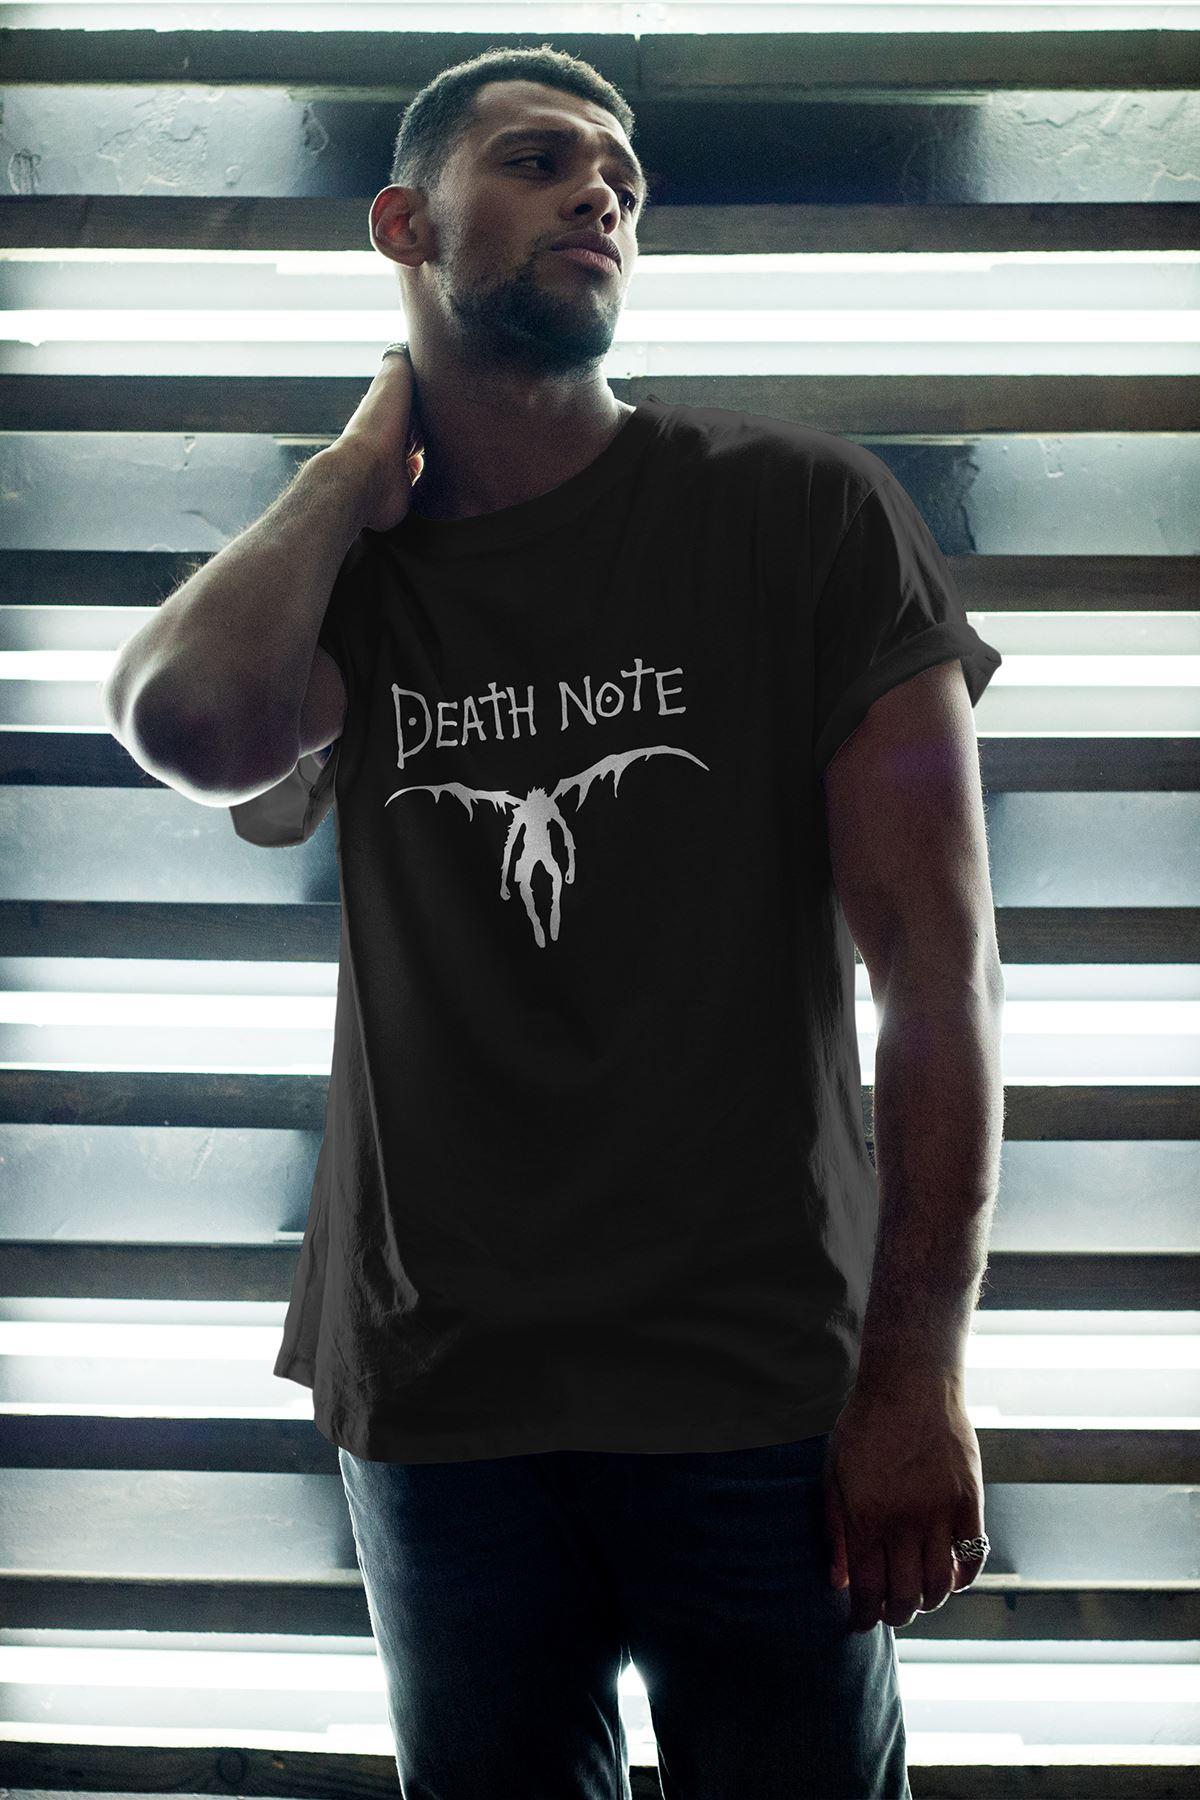 Anime Death Note 08 Siyah Erkek Oversize Tshirt - Tişört